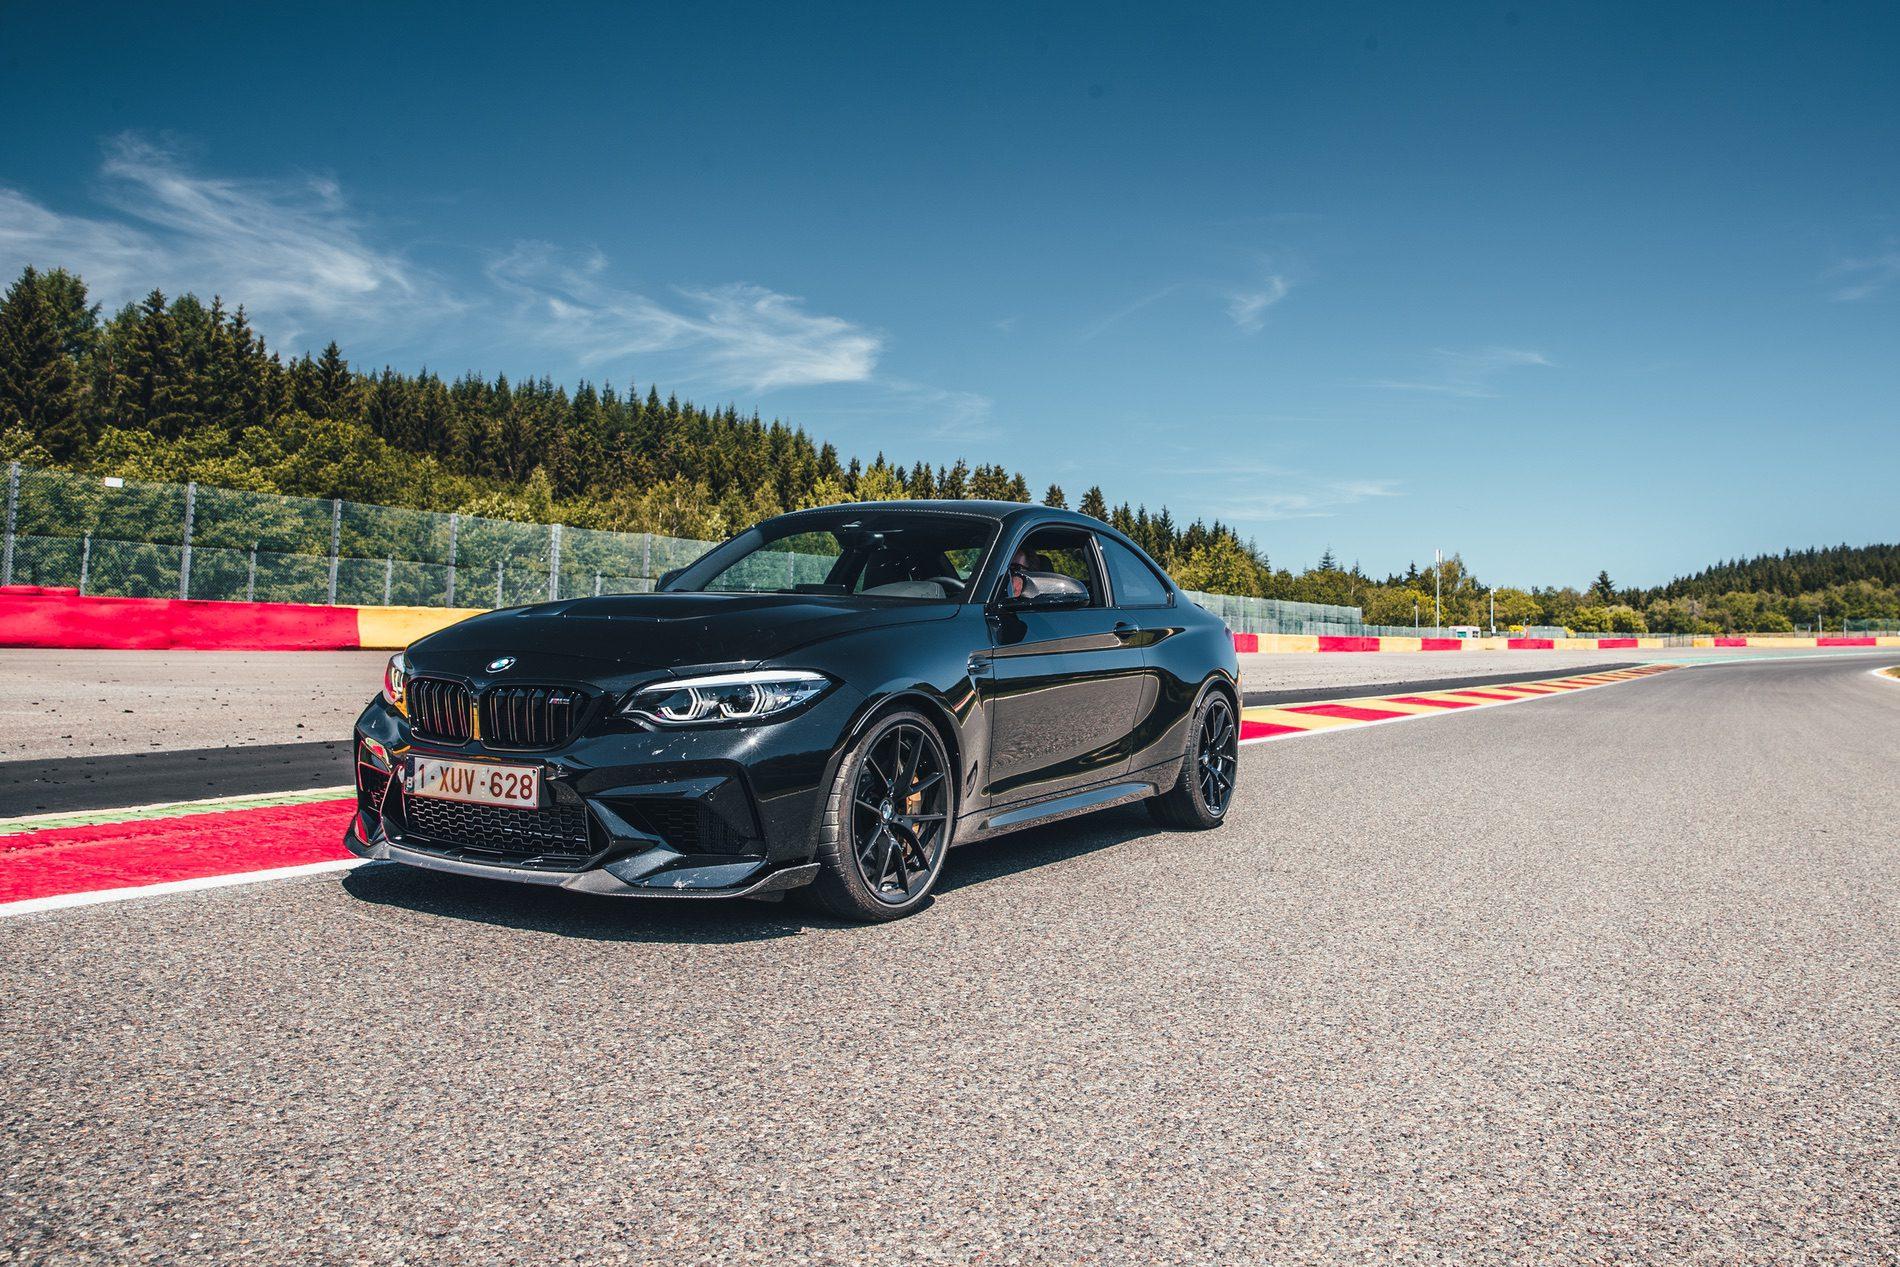 2021 BMW M2 CS Black Sapphire 12